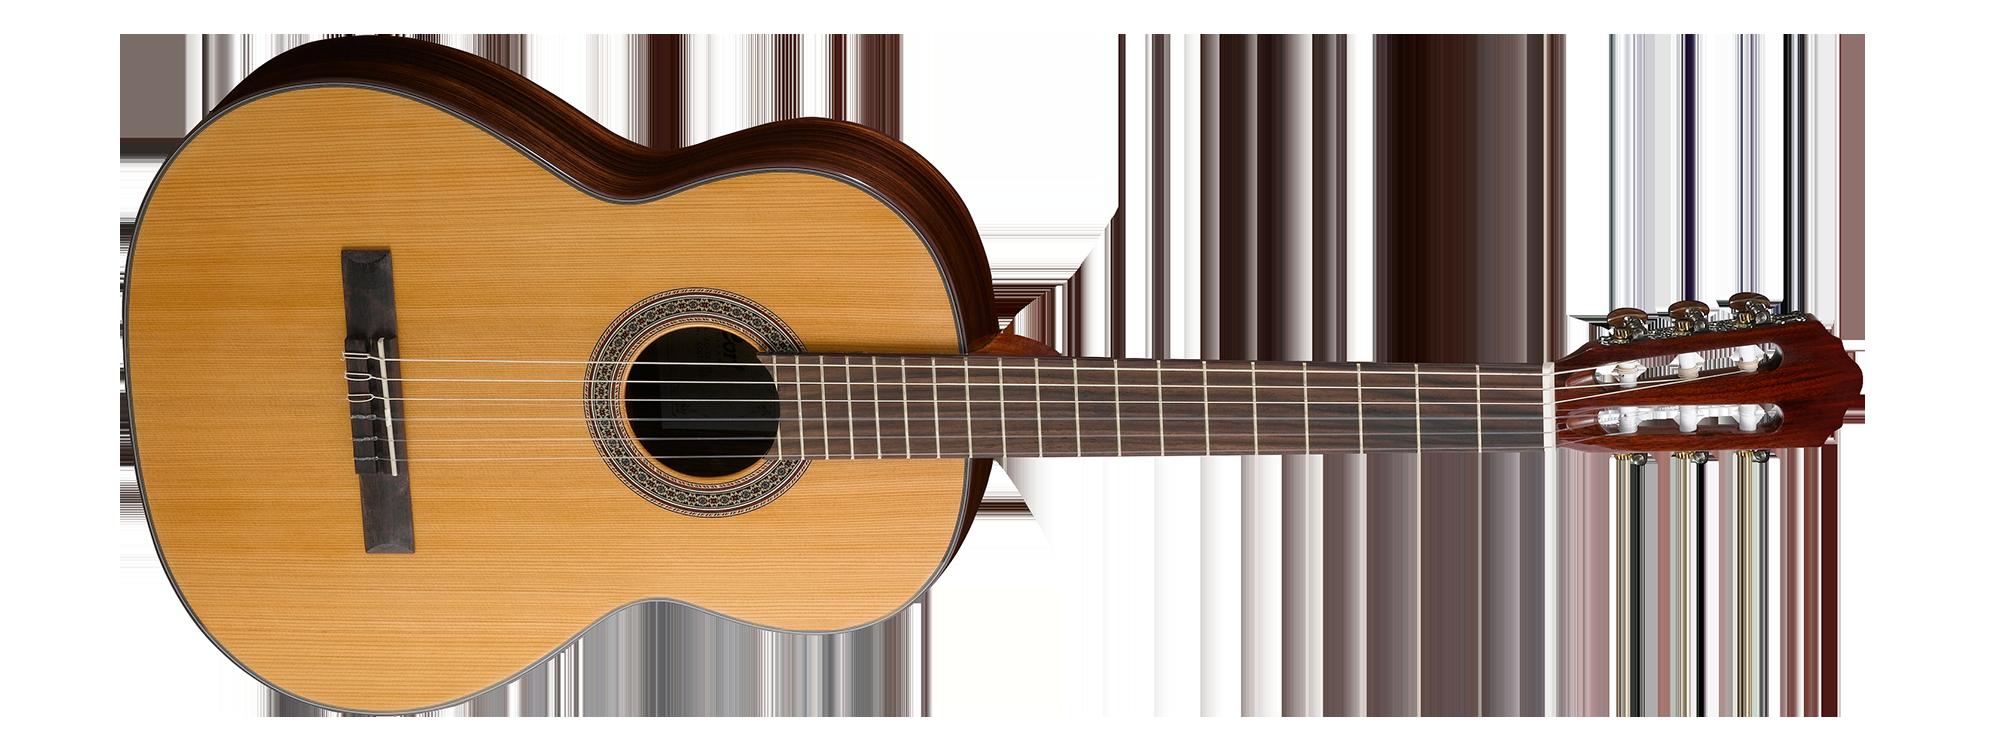 AC250 NAT